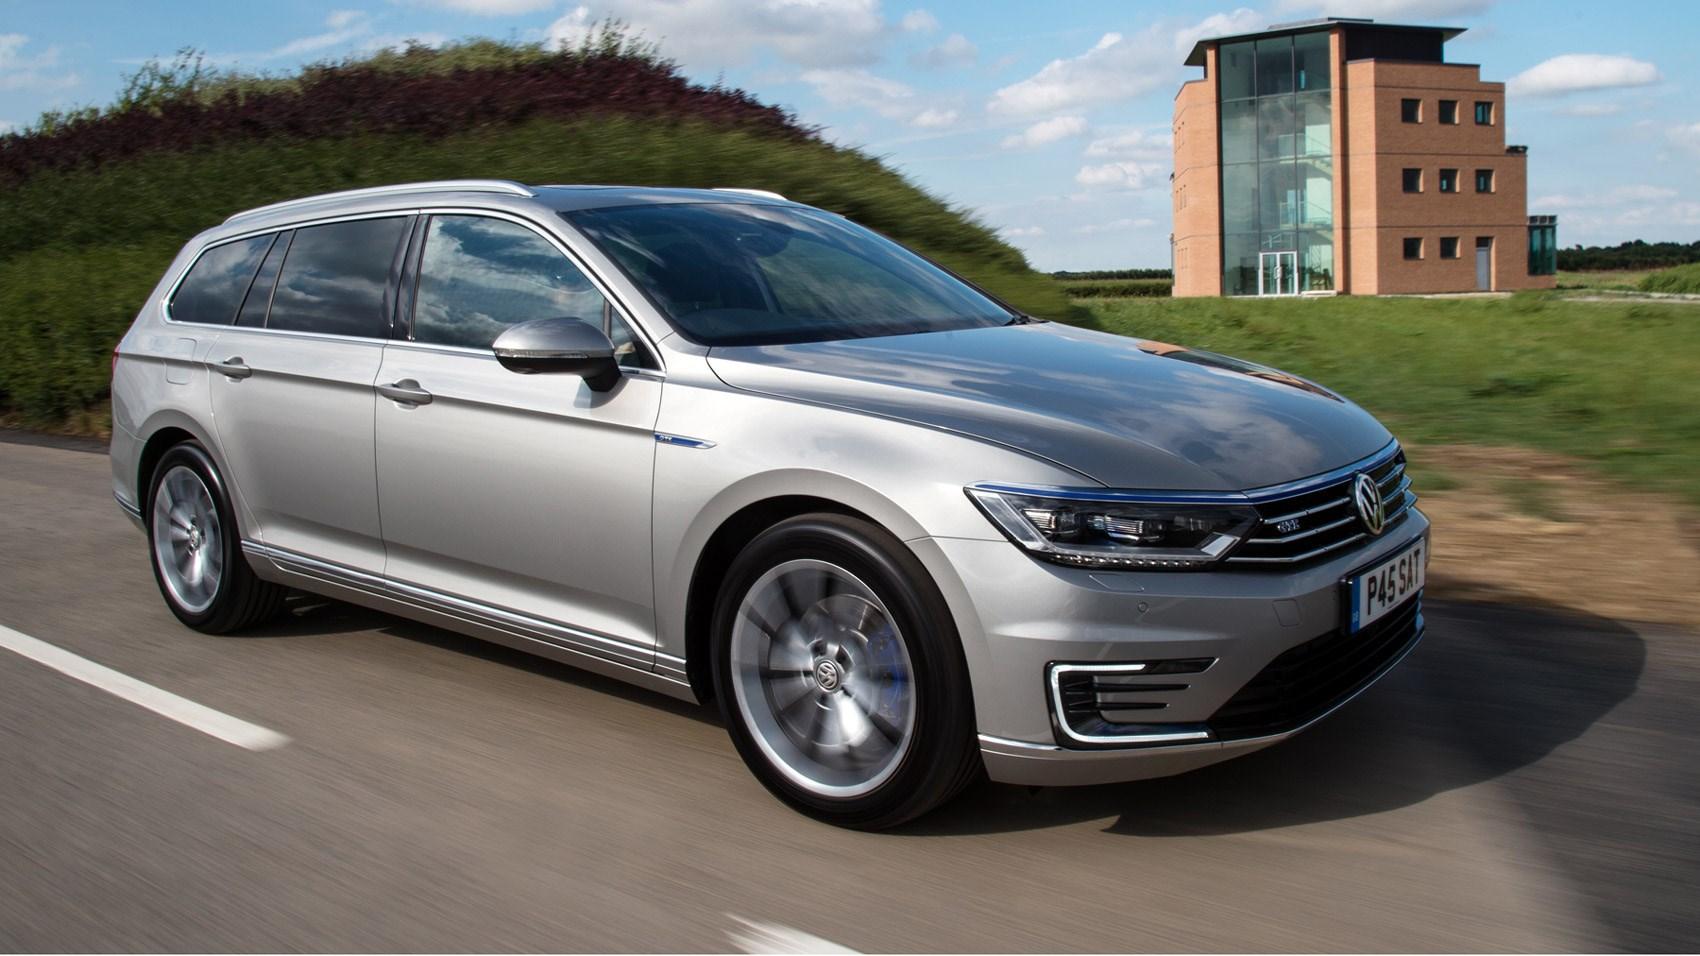 Volkswagen passat review 2017 autocar -  Note C Shaped Led Day Running Lights On Passat Gte